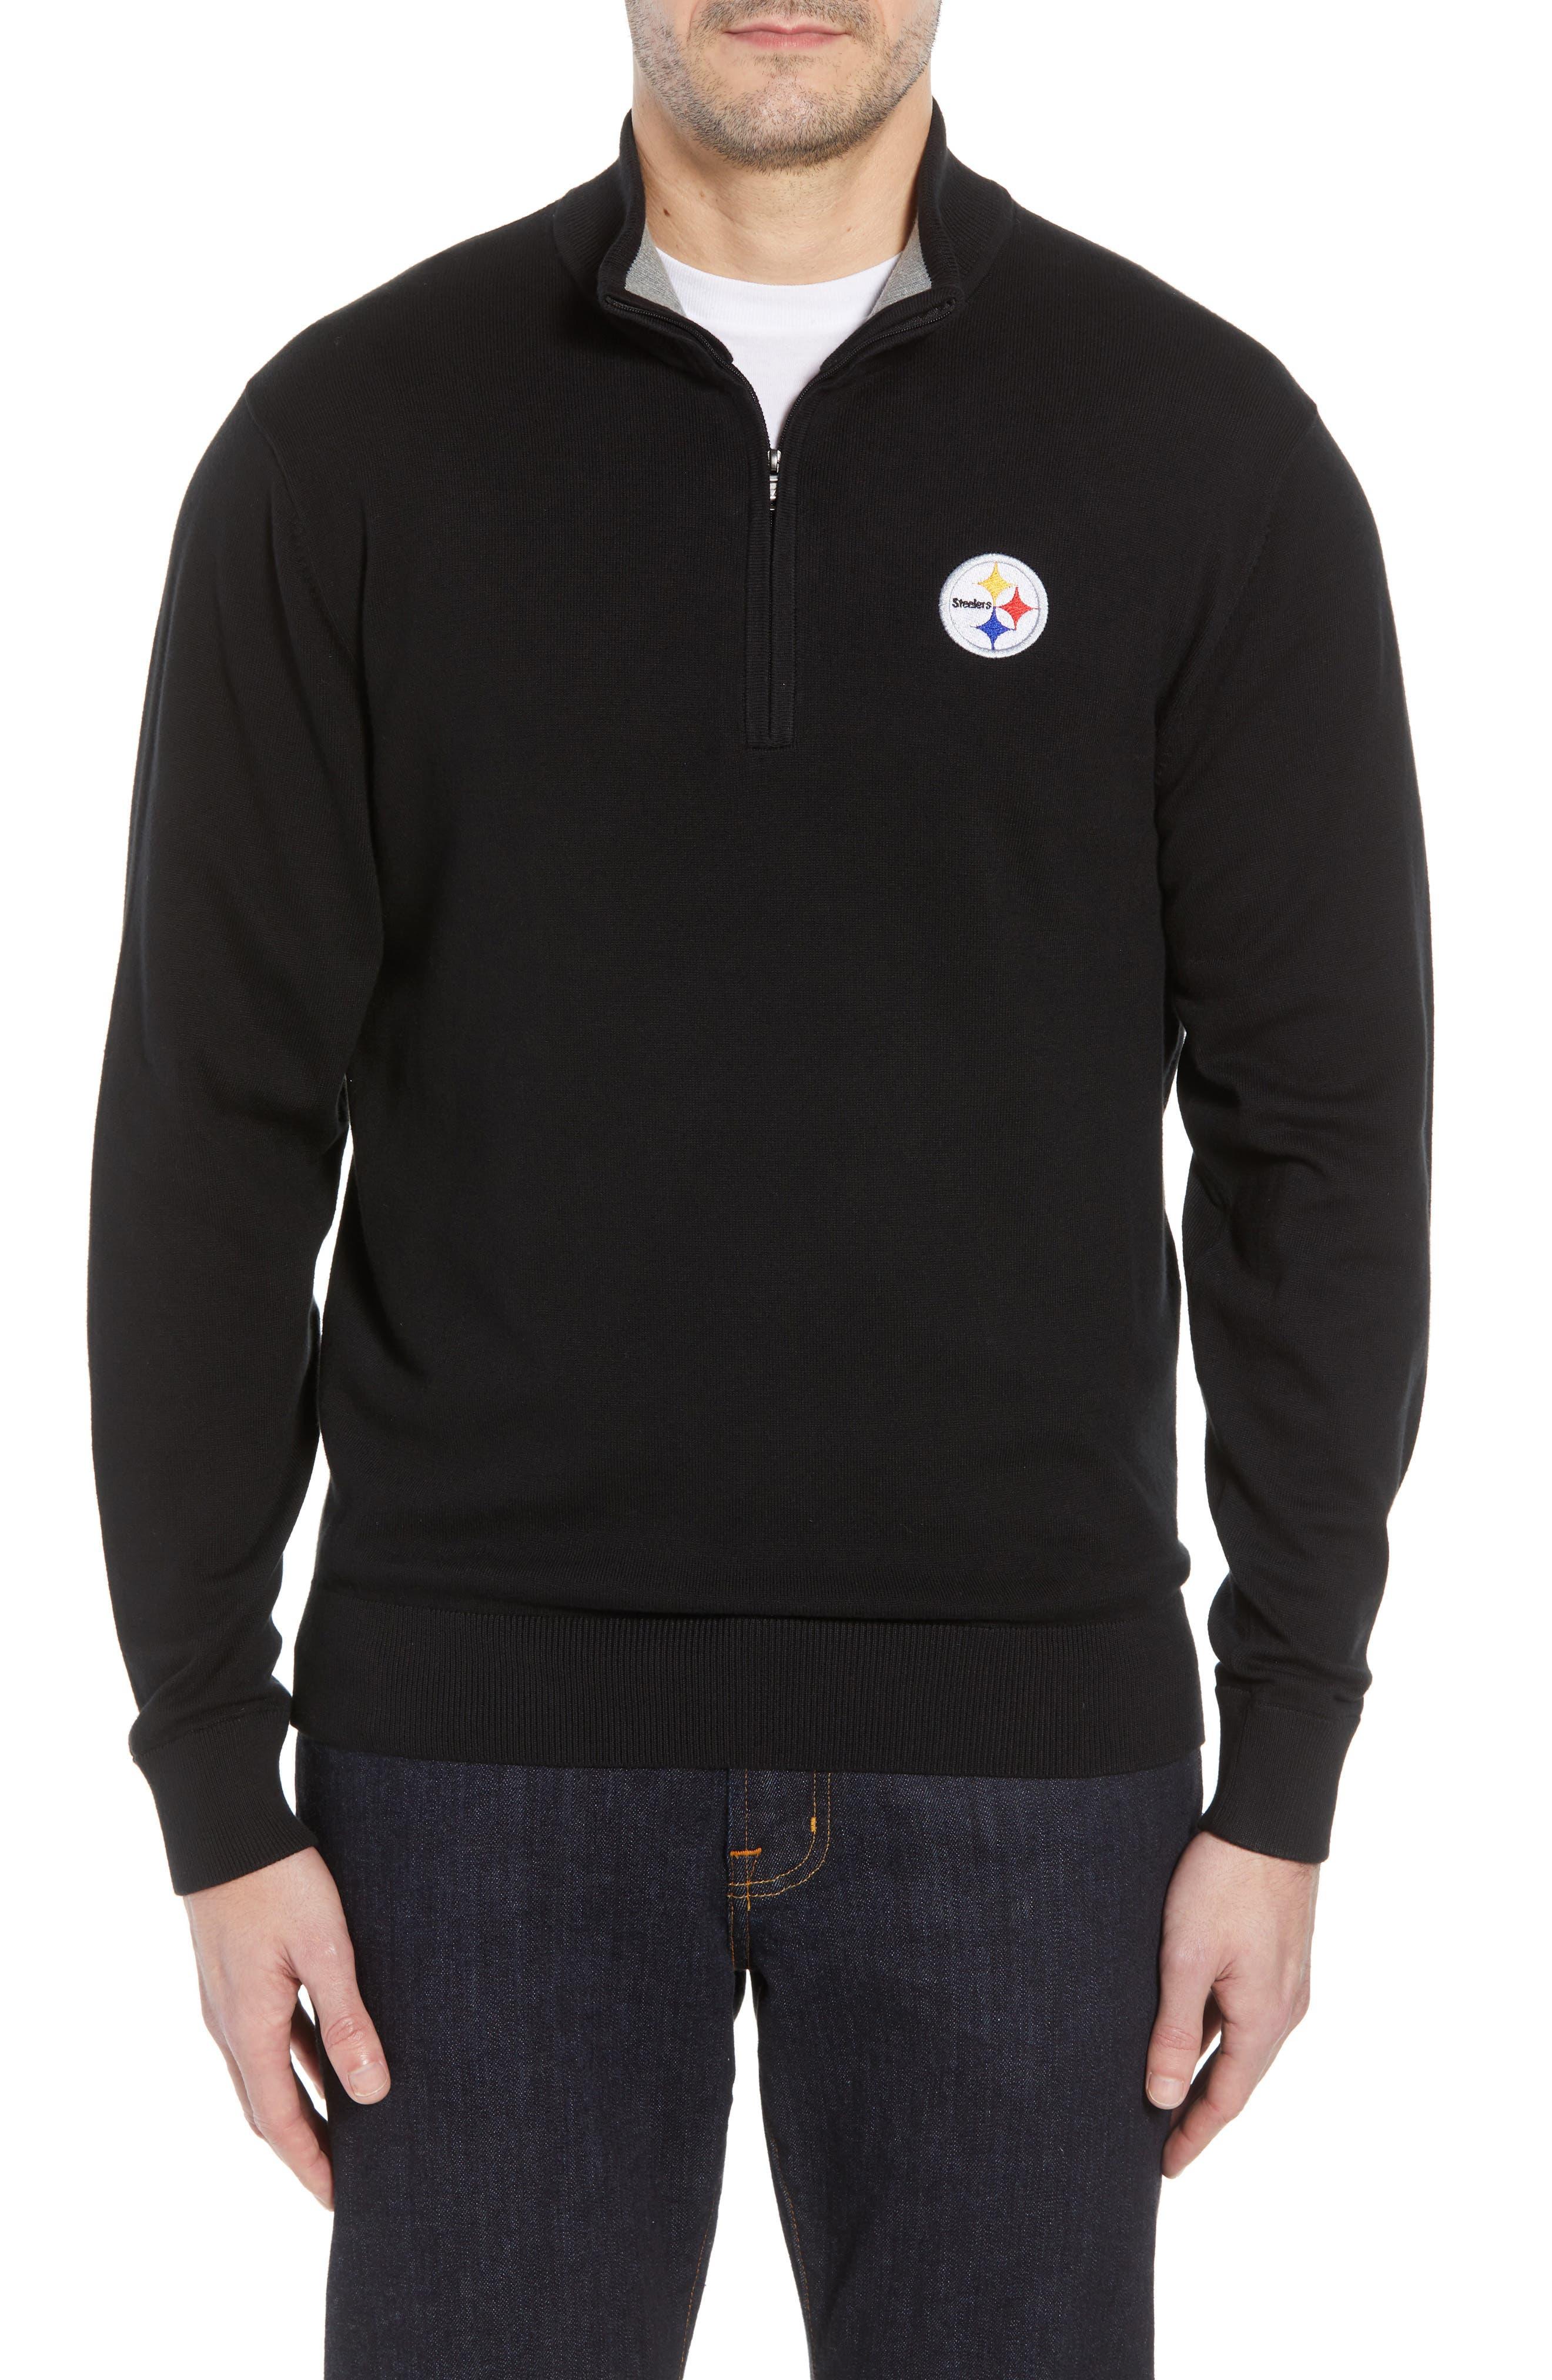 Pittsburgh Steelers - Lakemont Regular Fit Half Zip Sweater,                         Main,                         color, 001